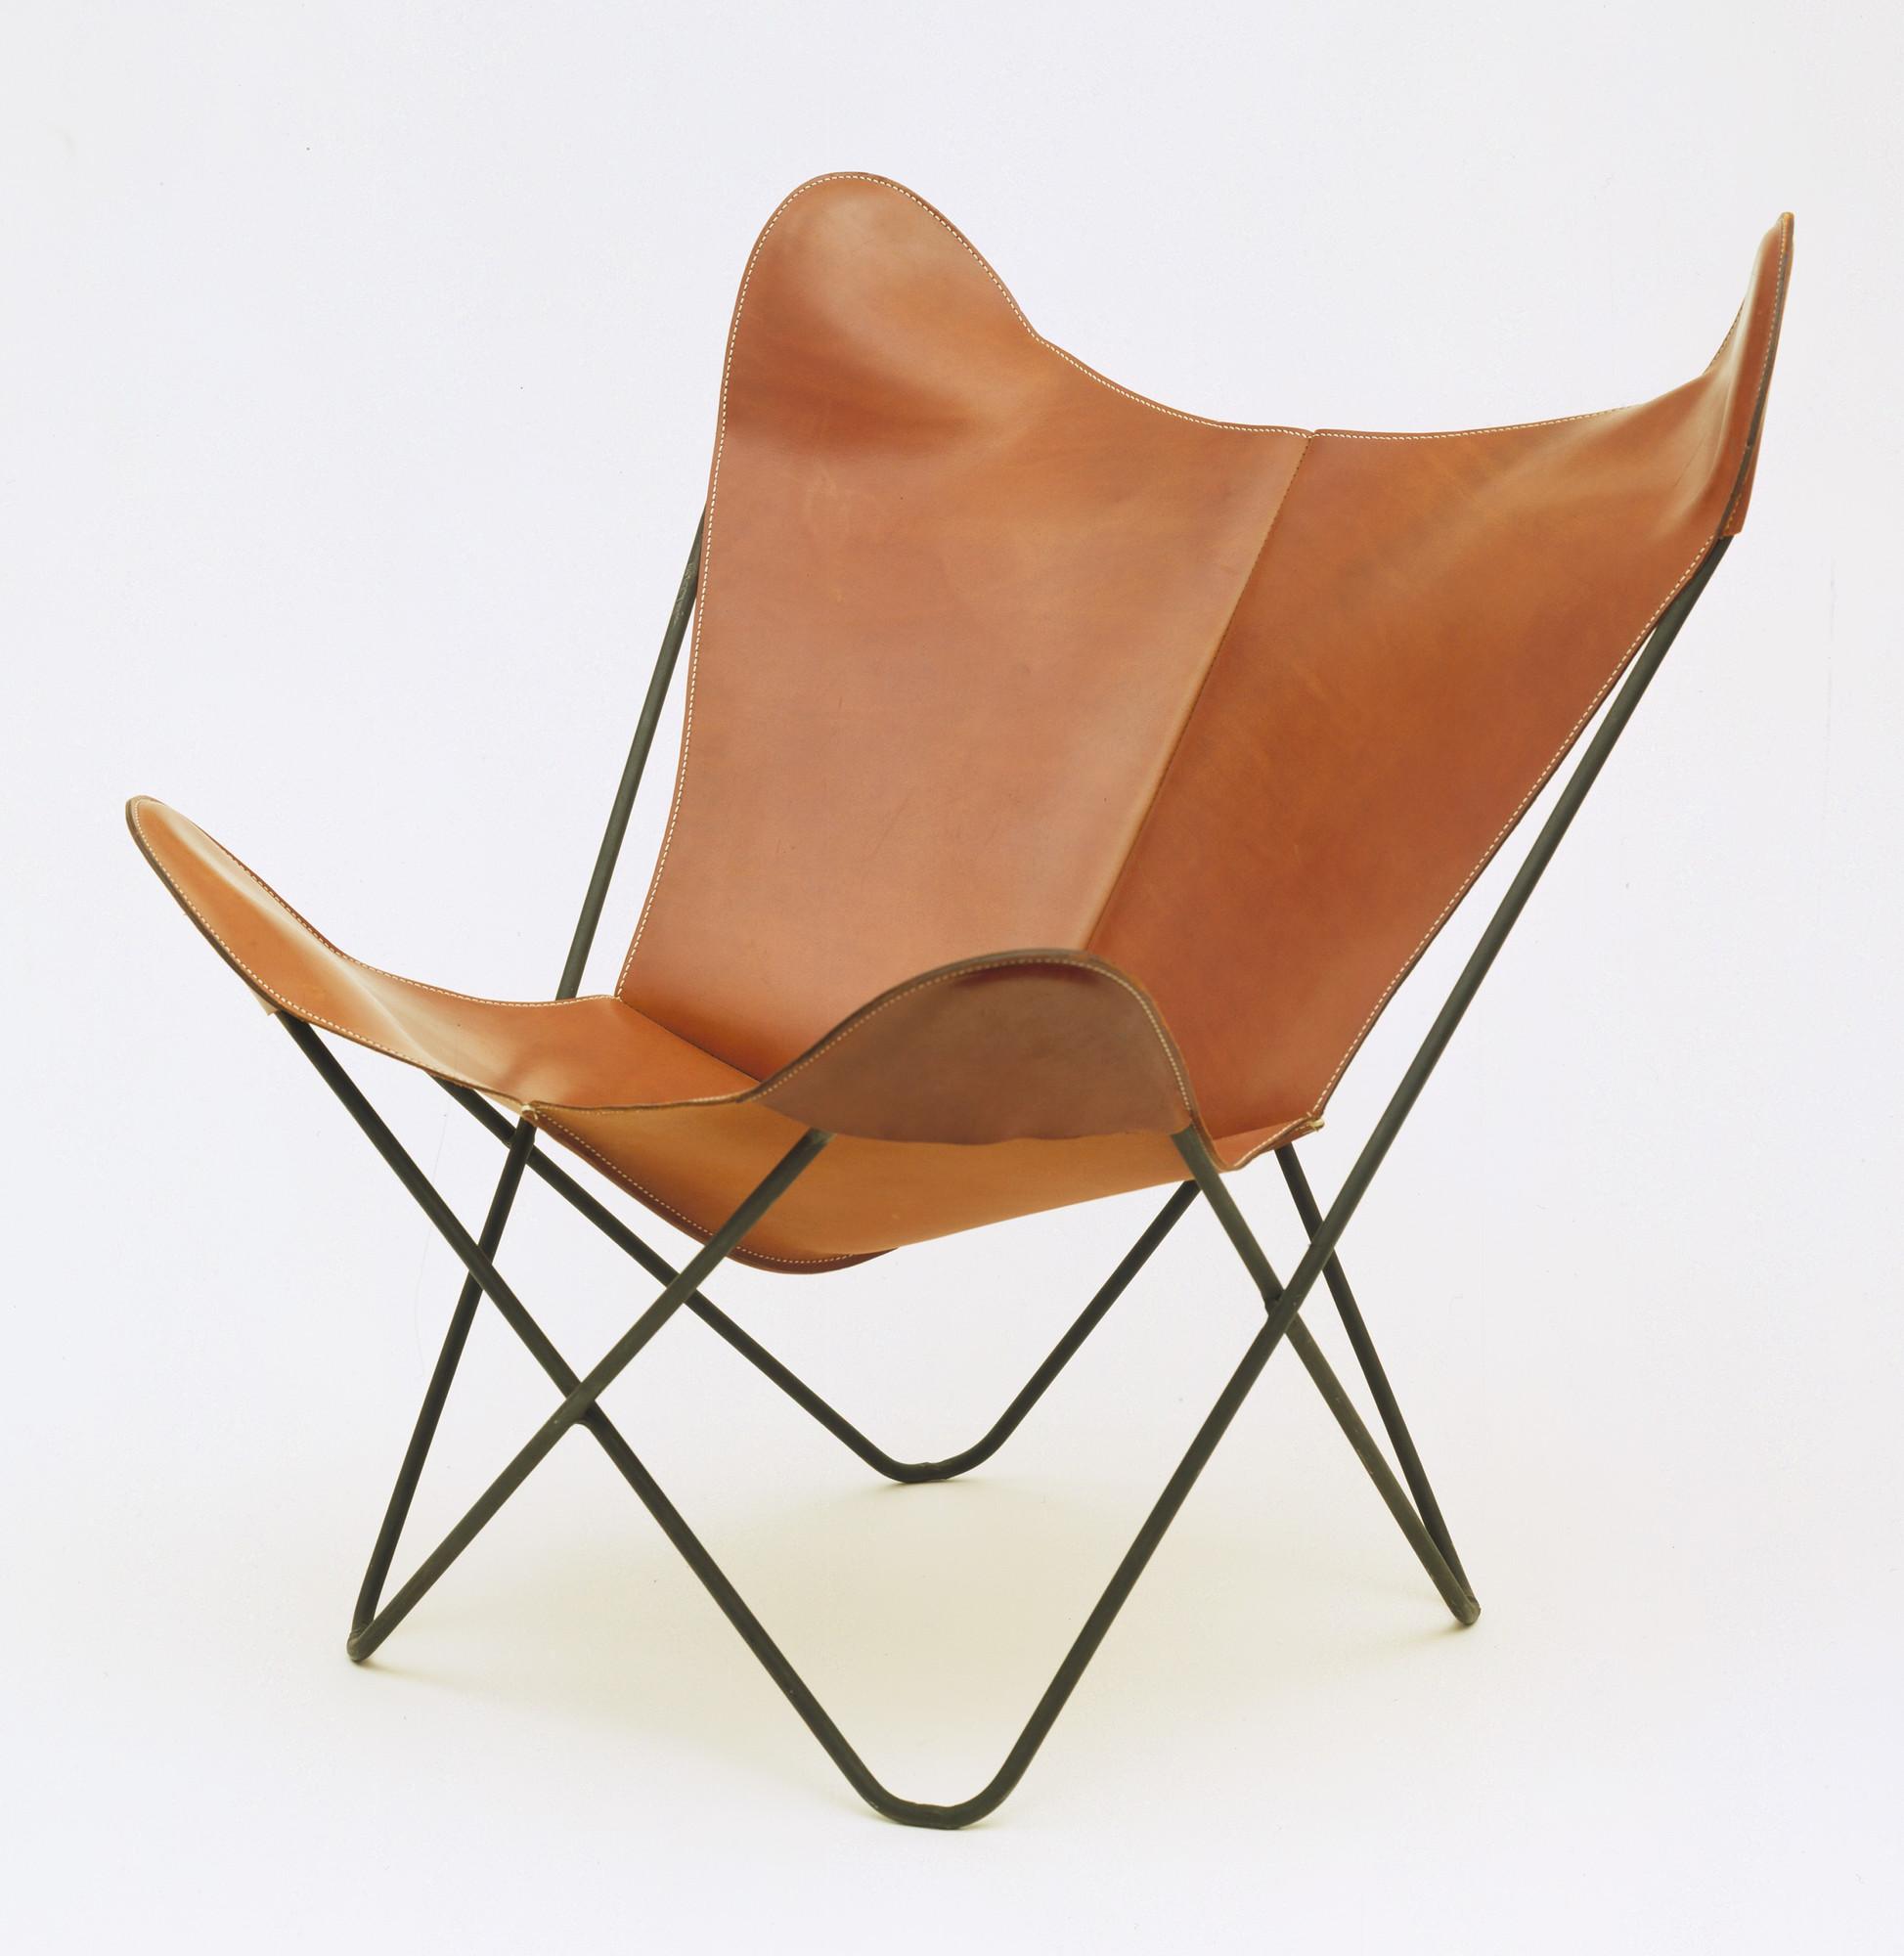 Antonio Bonet, Juan Kurchan, Jorge Ferrari Hardoy. B.K.F. Chair ...